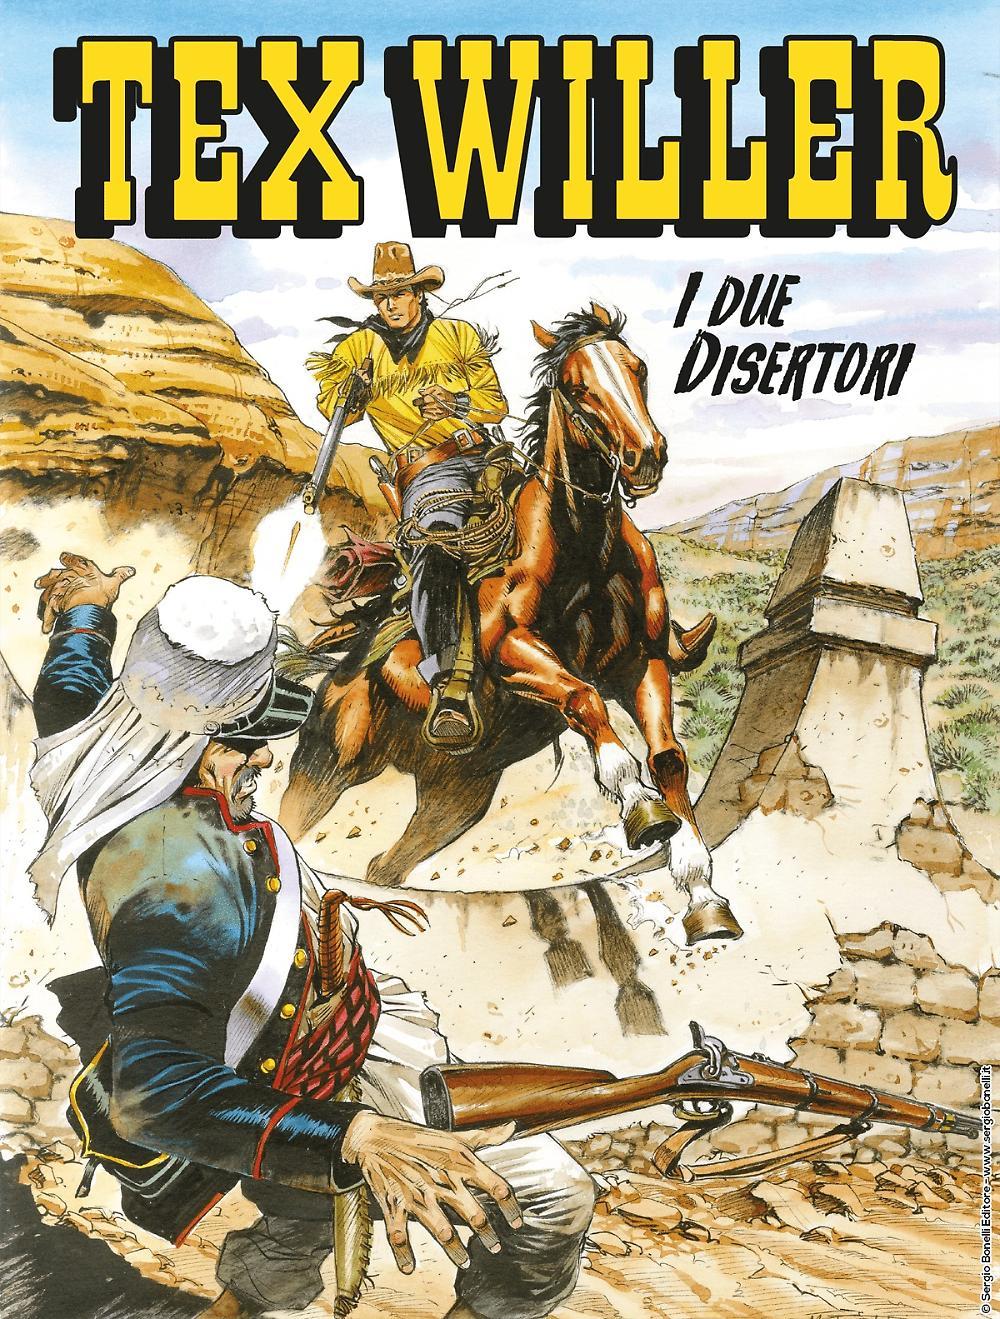 Tex Willer 5: I due disertori, copertina di Maurizio Dotti